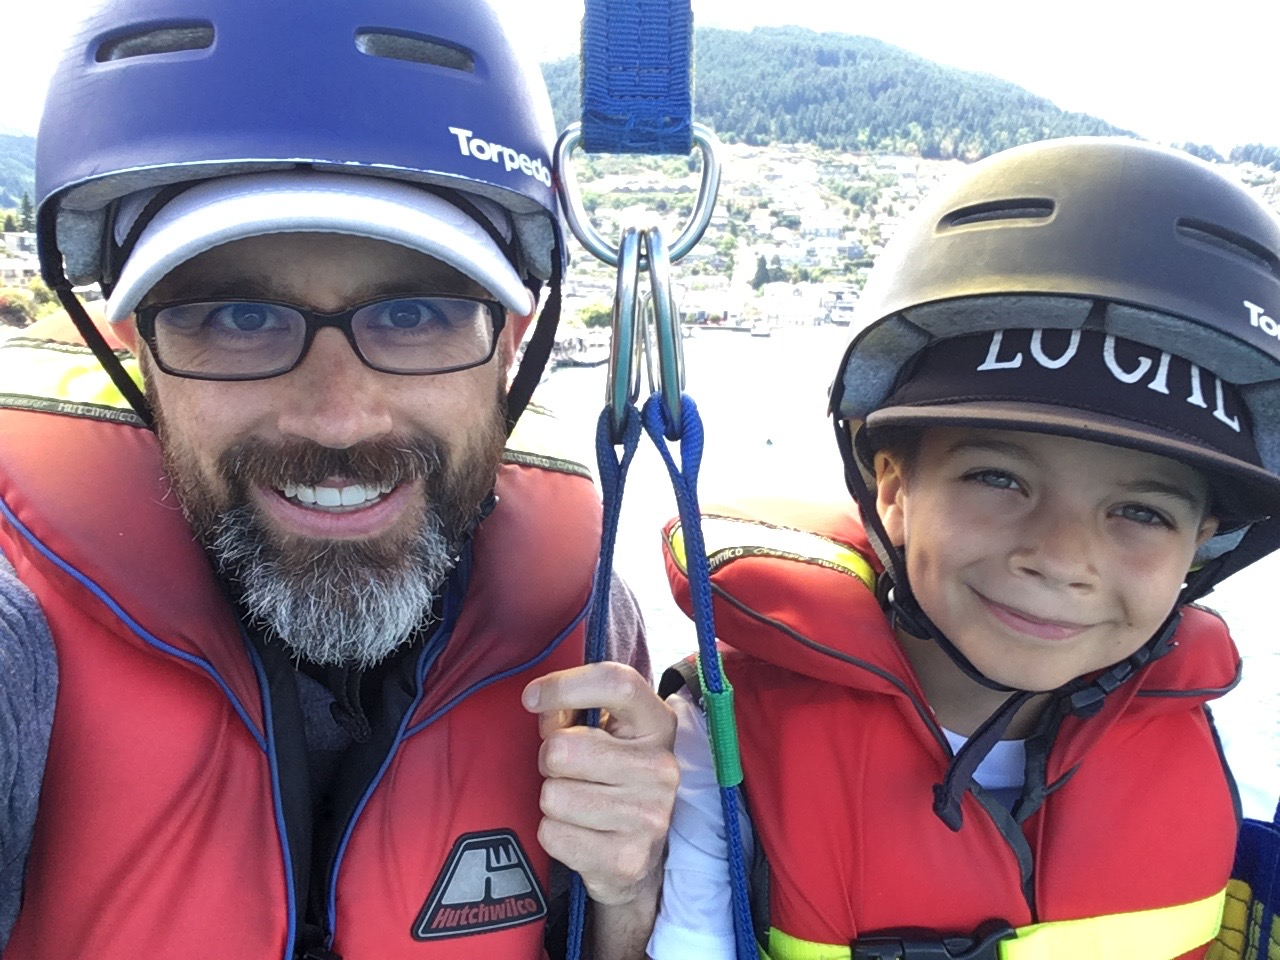 Christian and Blake parasailing